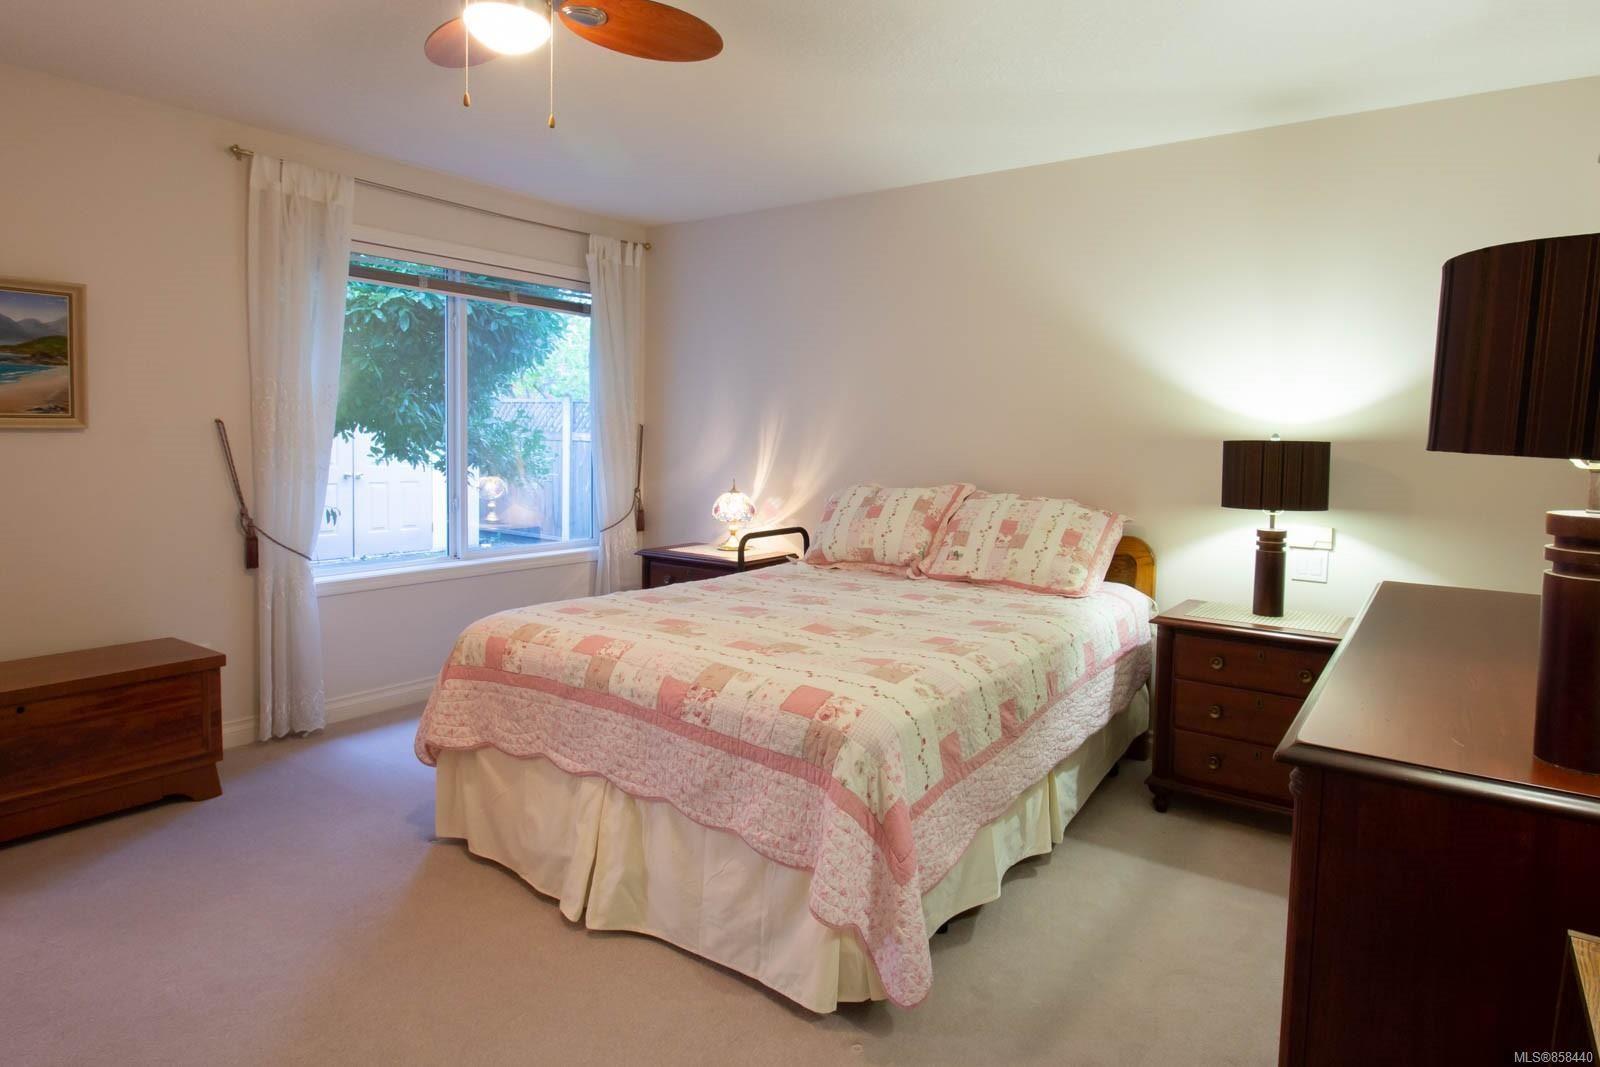 Photo 7: Photos: 798 Devon Pl in : PQ Qualicum Beach House for sale (Parksville/Qualicum)  : MLS®# 858440